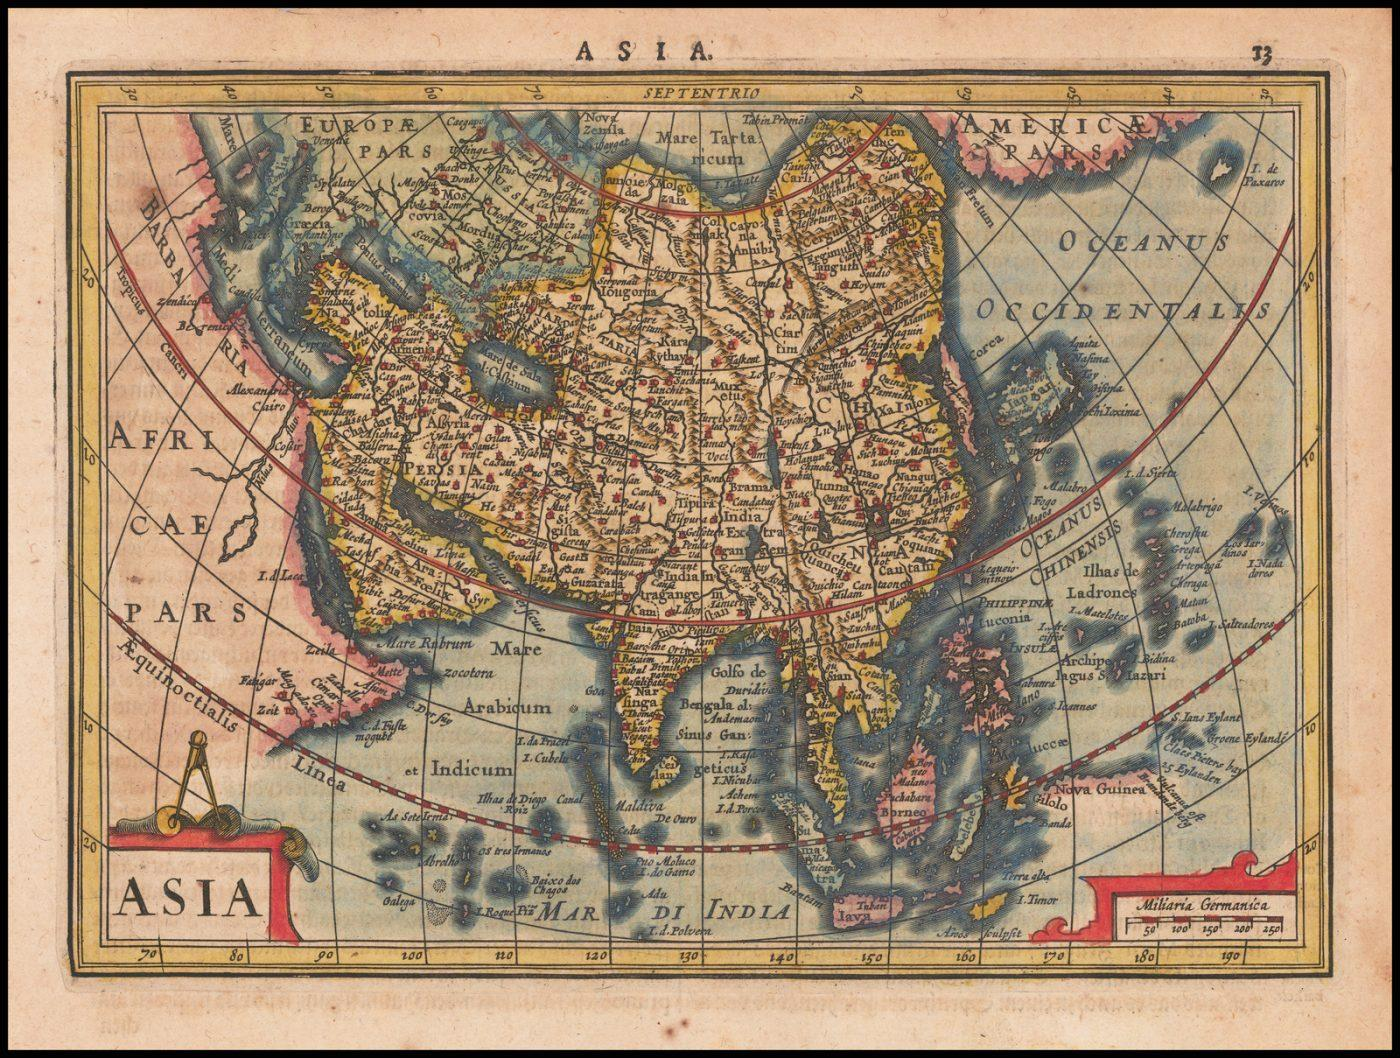 Подробная ранняя карта Азии из атласа Меркатора-Хондия